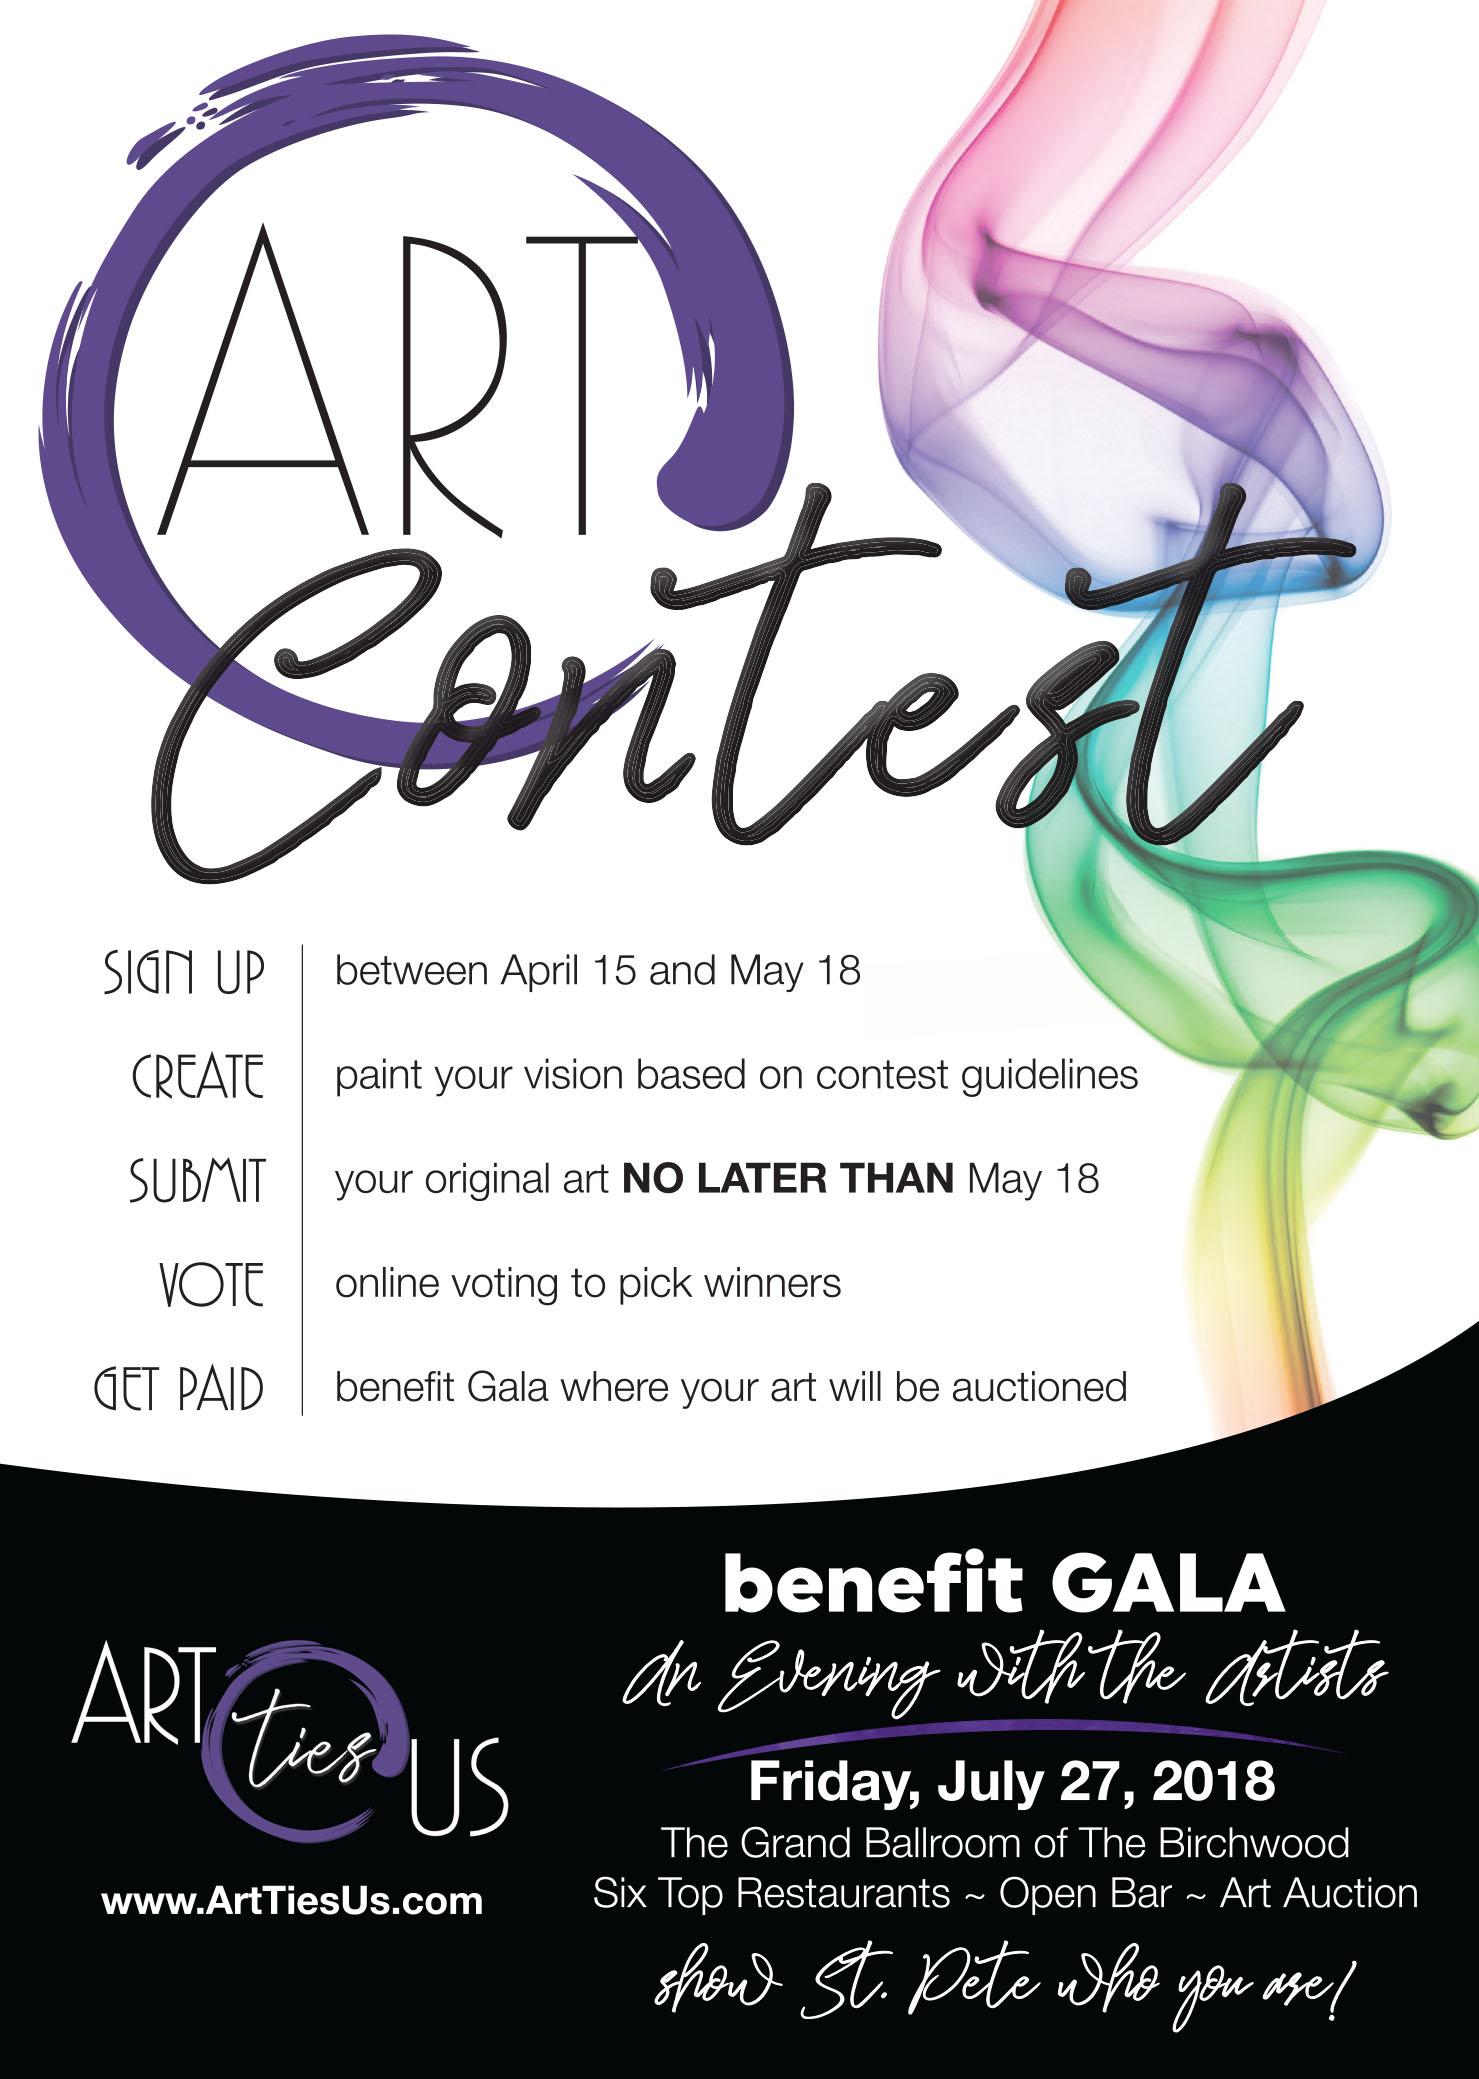 Contest Information